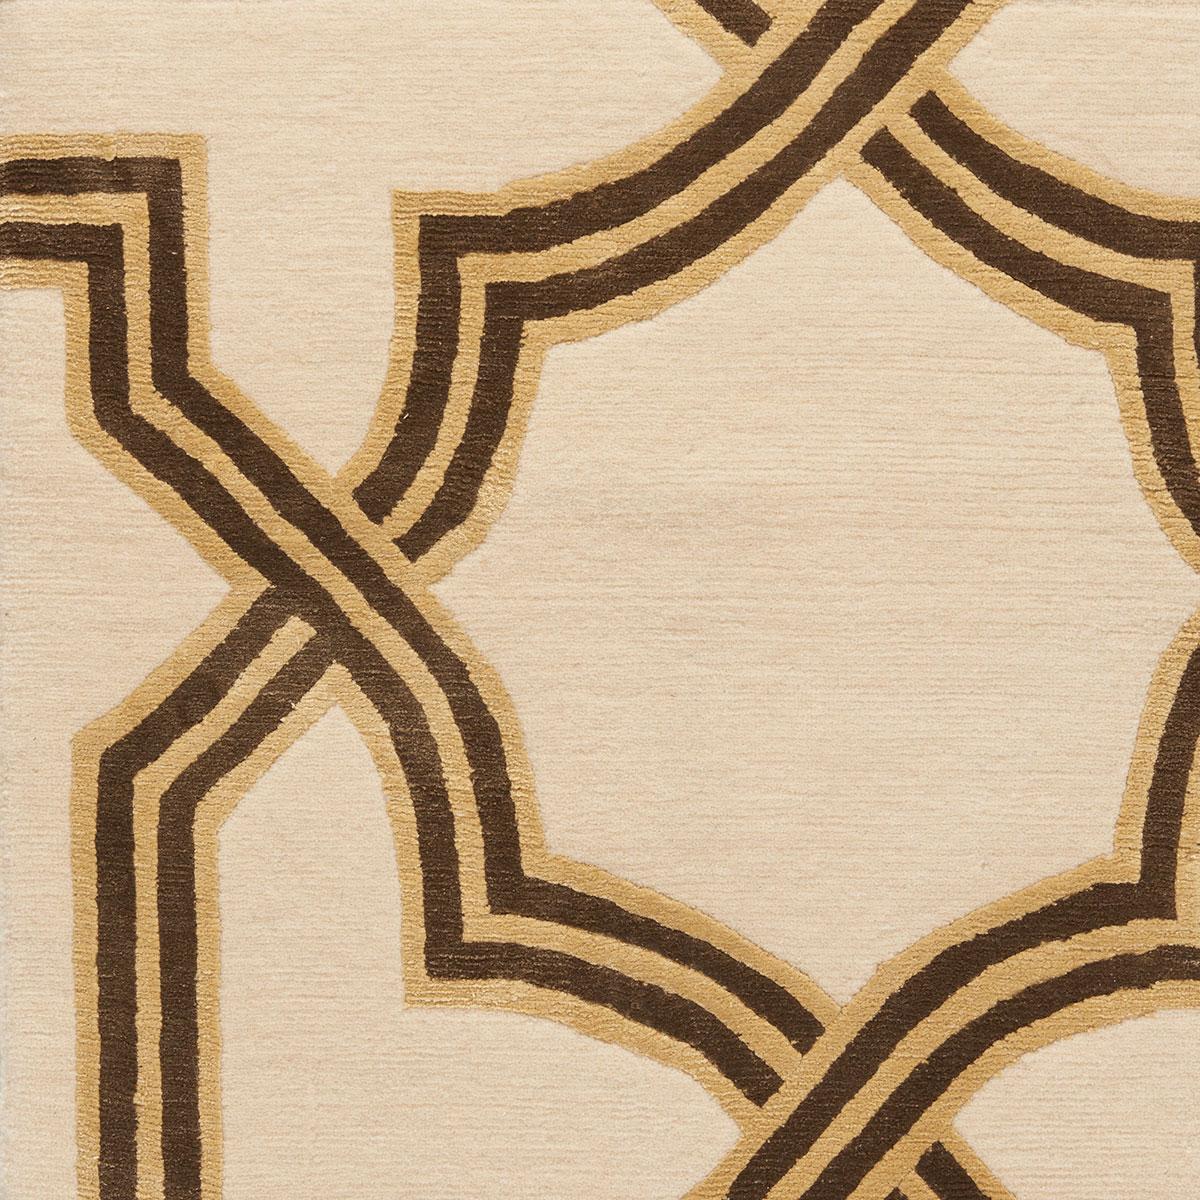 arabesque-maze_wool-silk_hand-knotted_patterson-flynn-martin_pfm